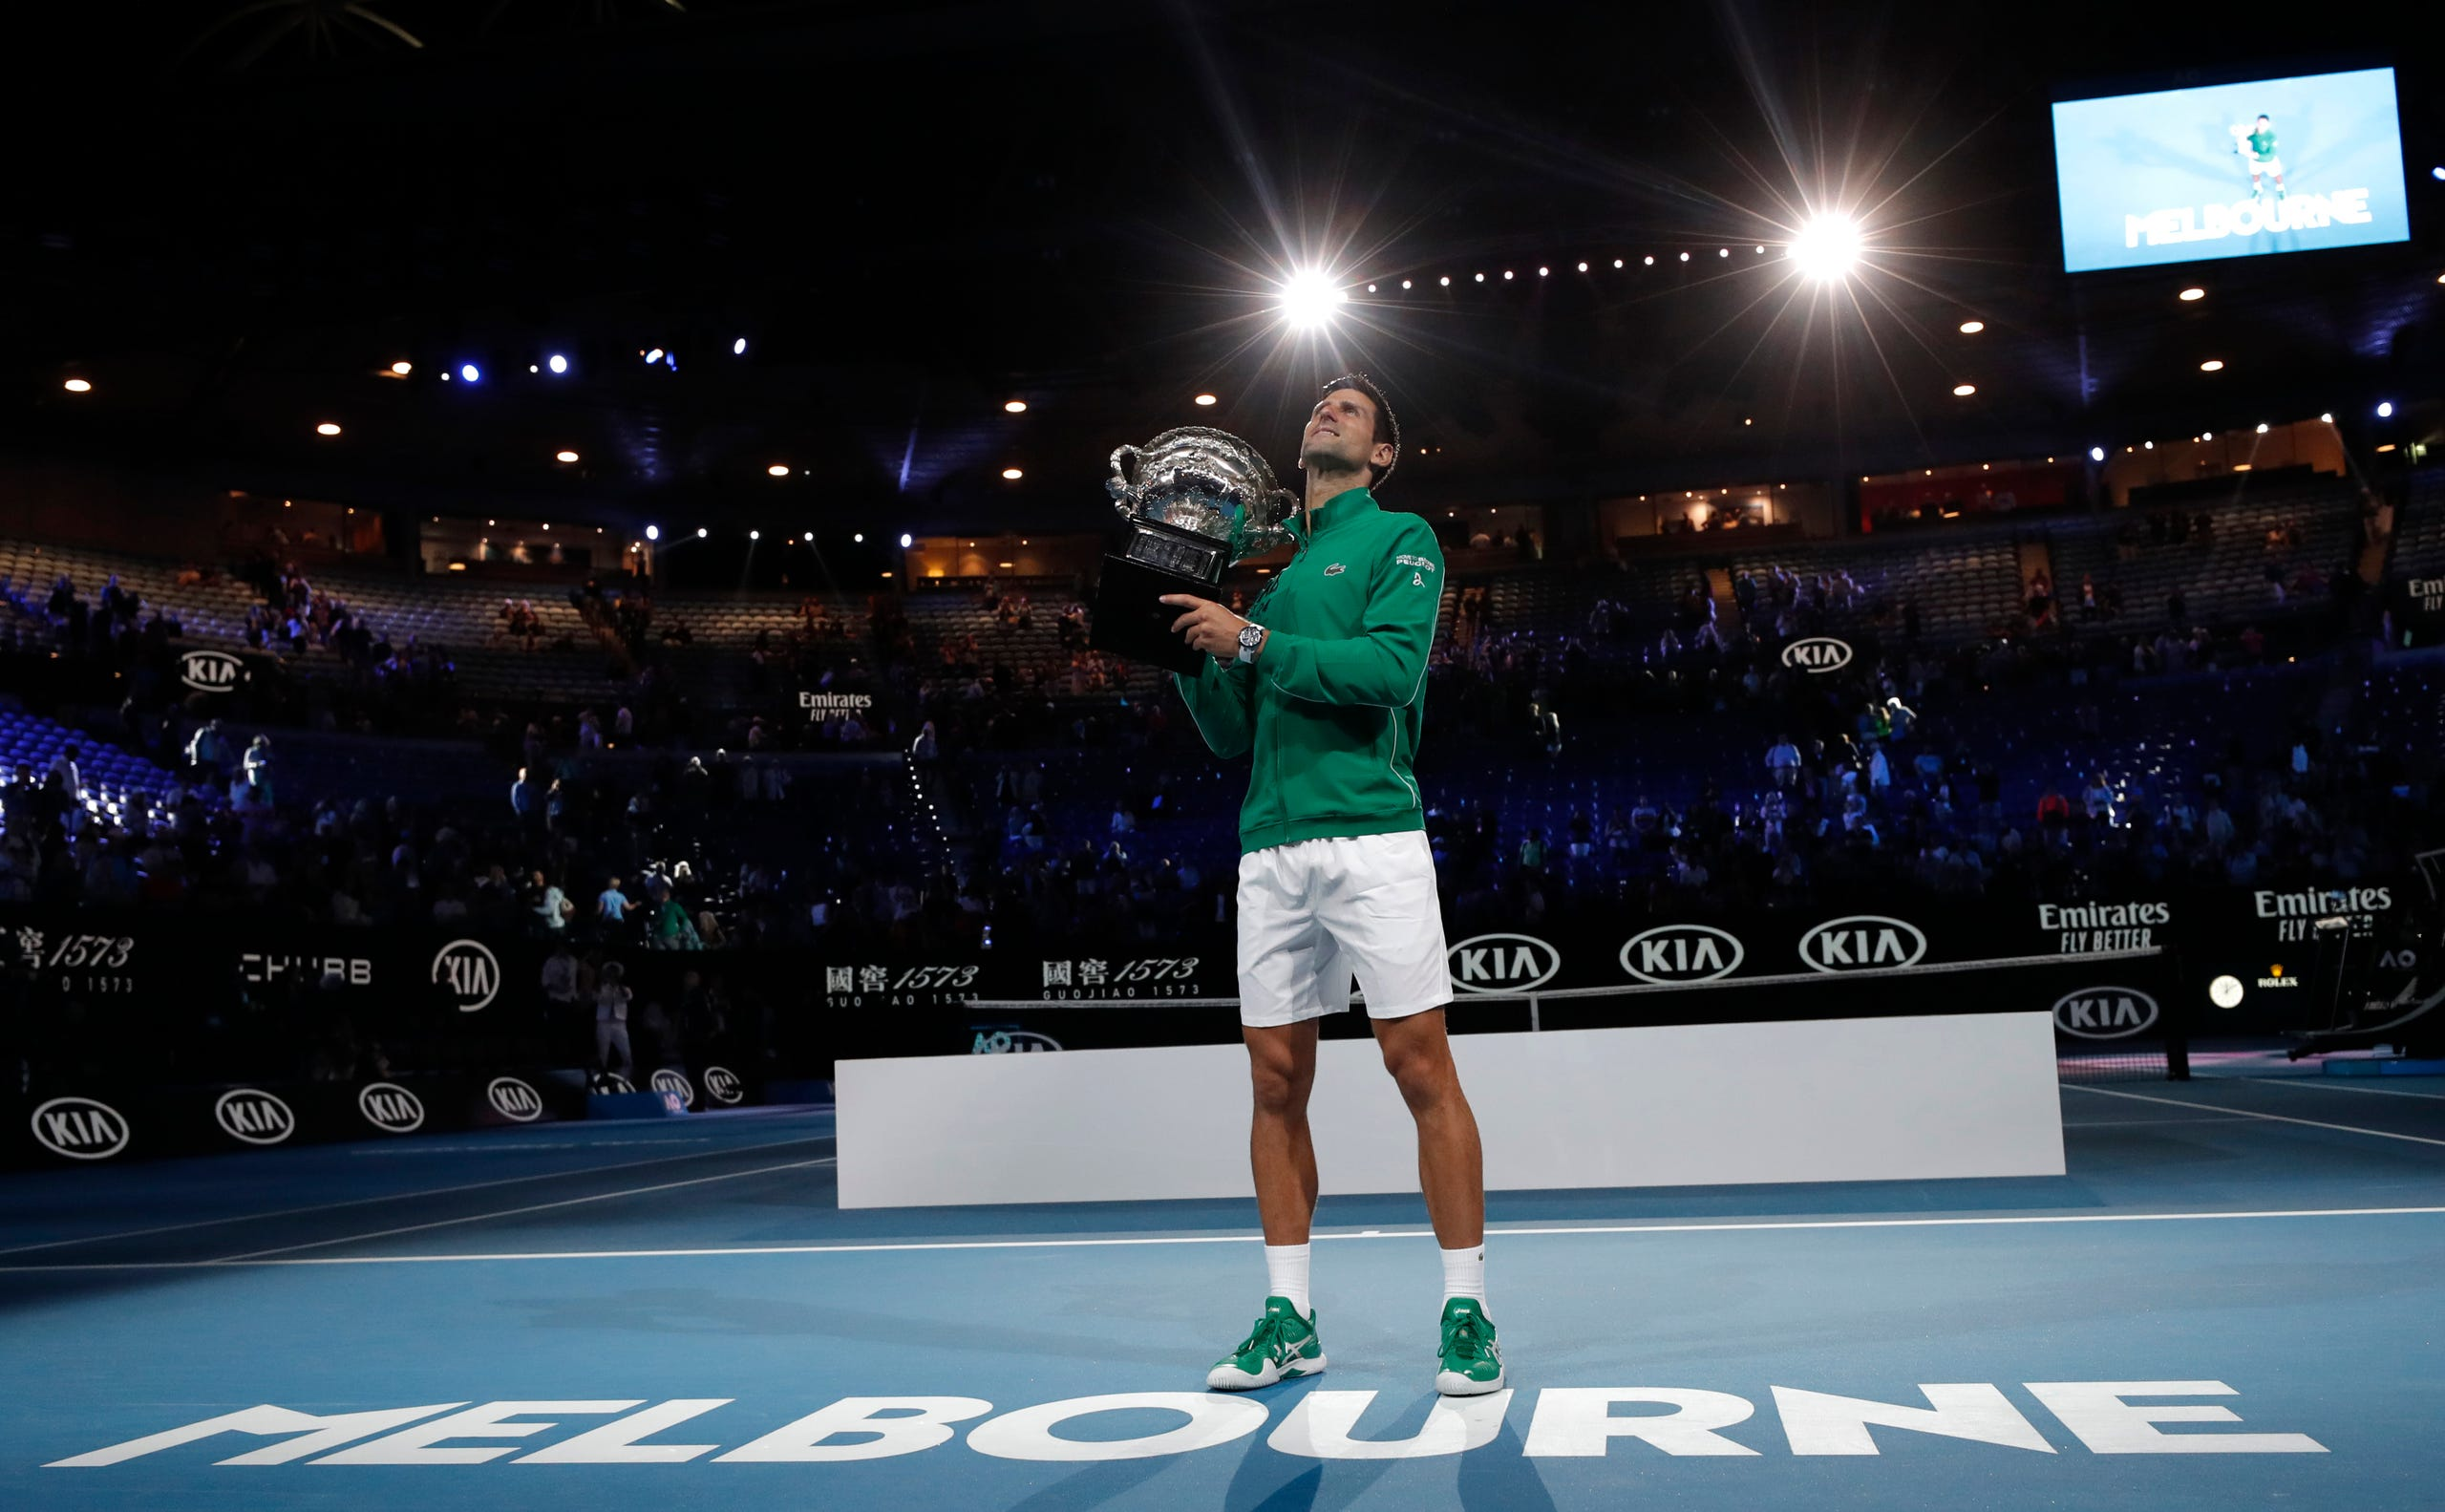 2020 Australian Open Best Images From Grand Slam Tennis Tournament